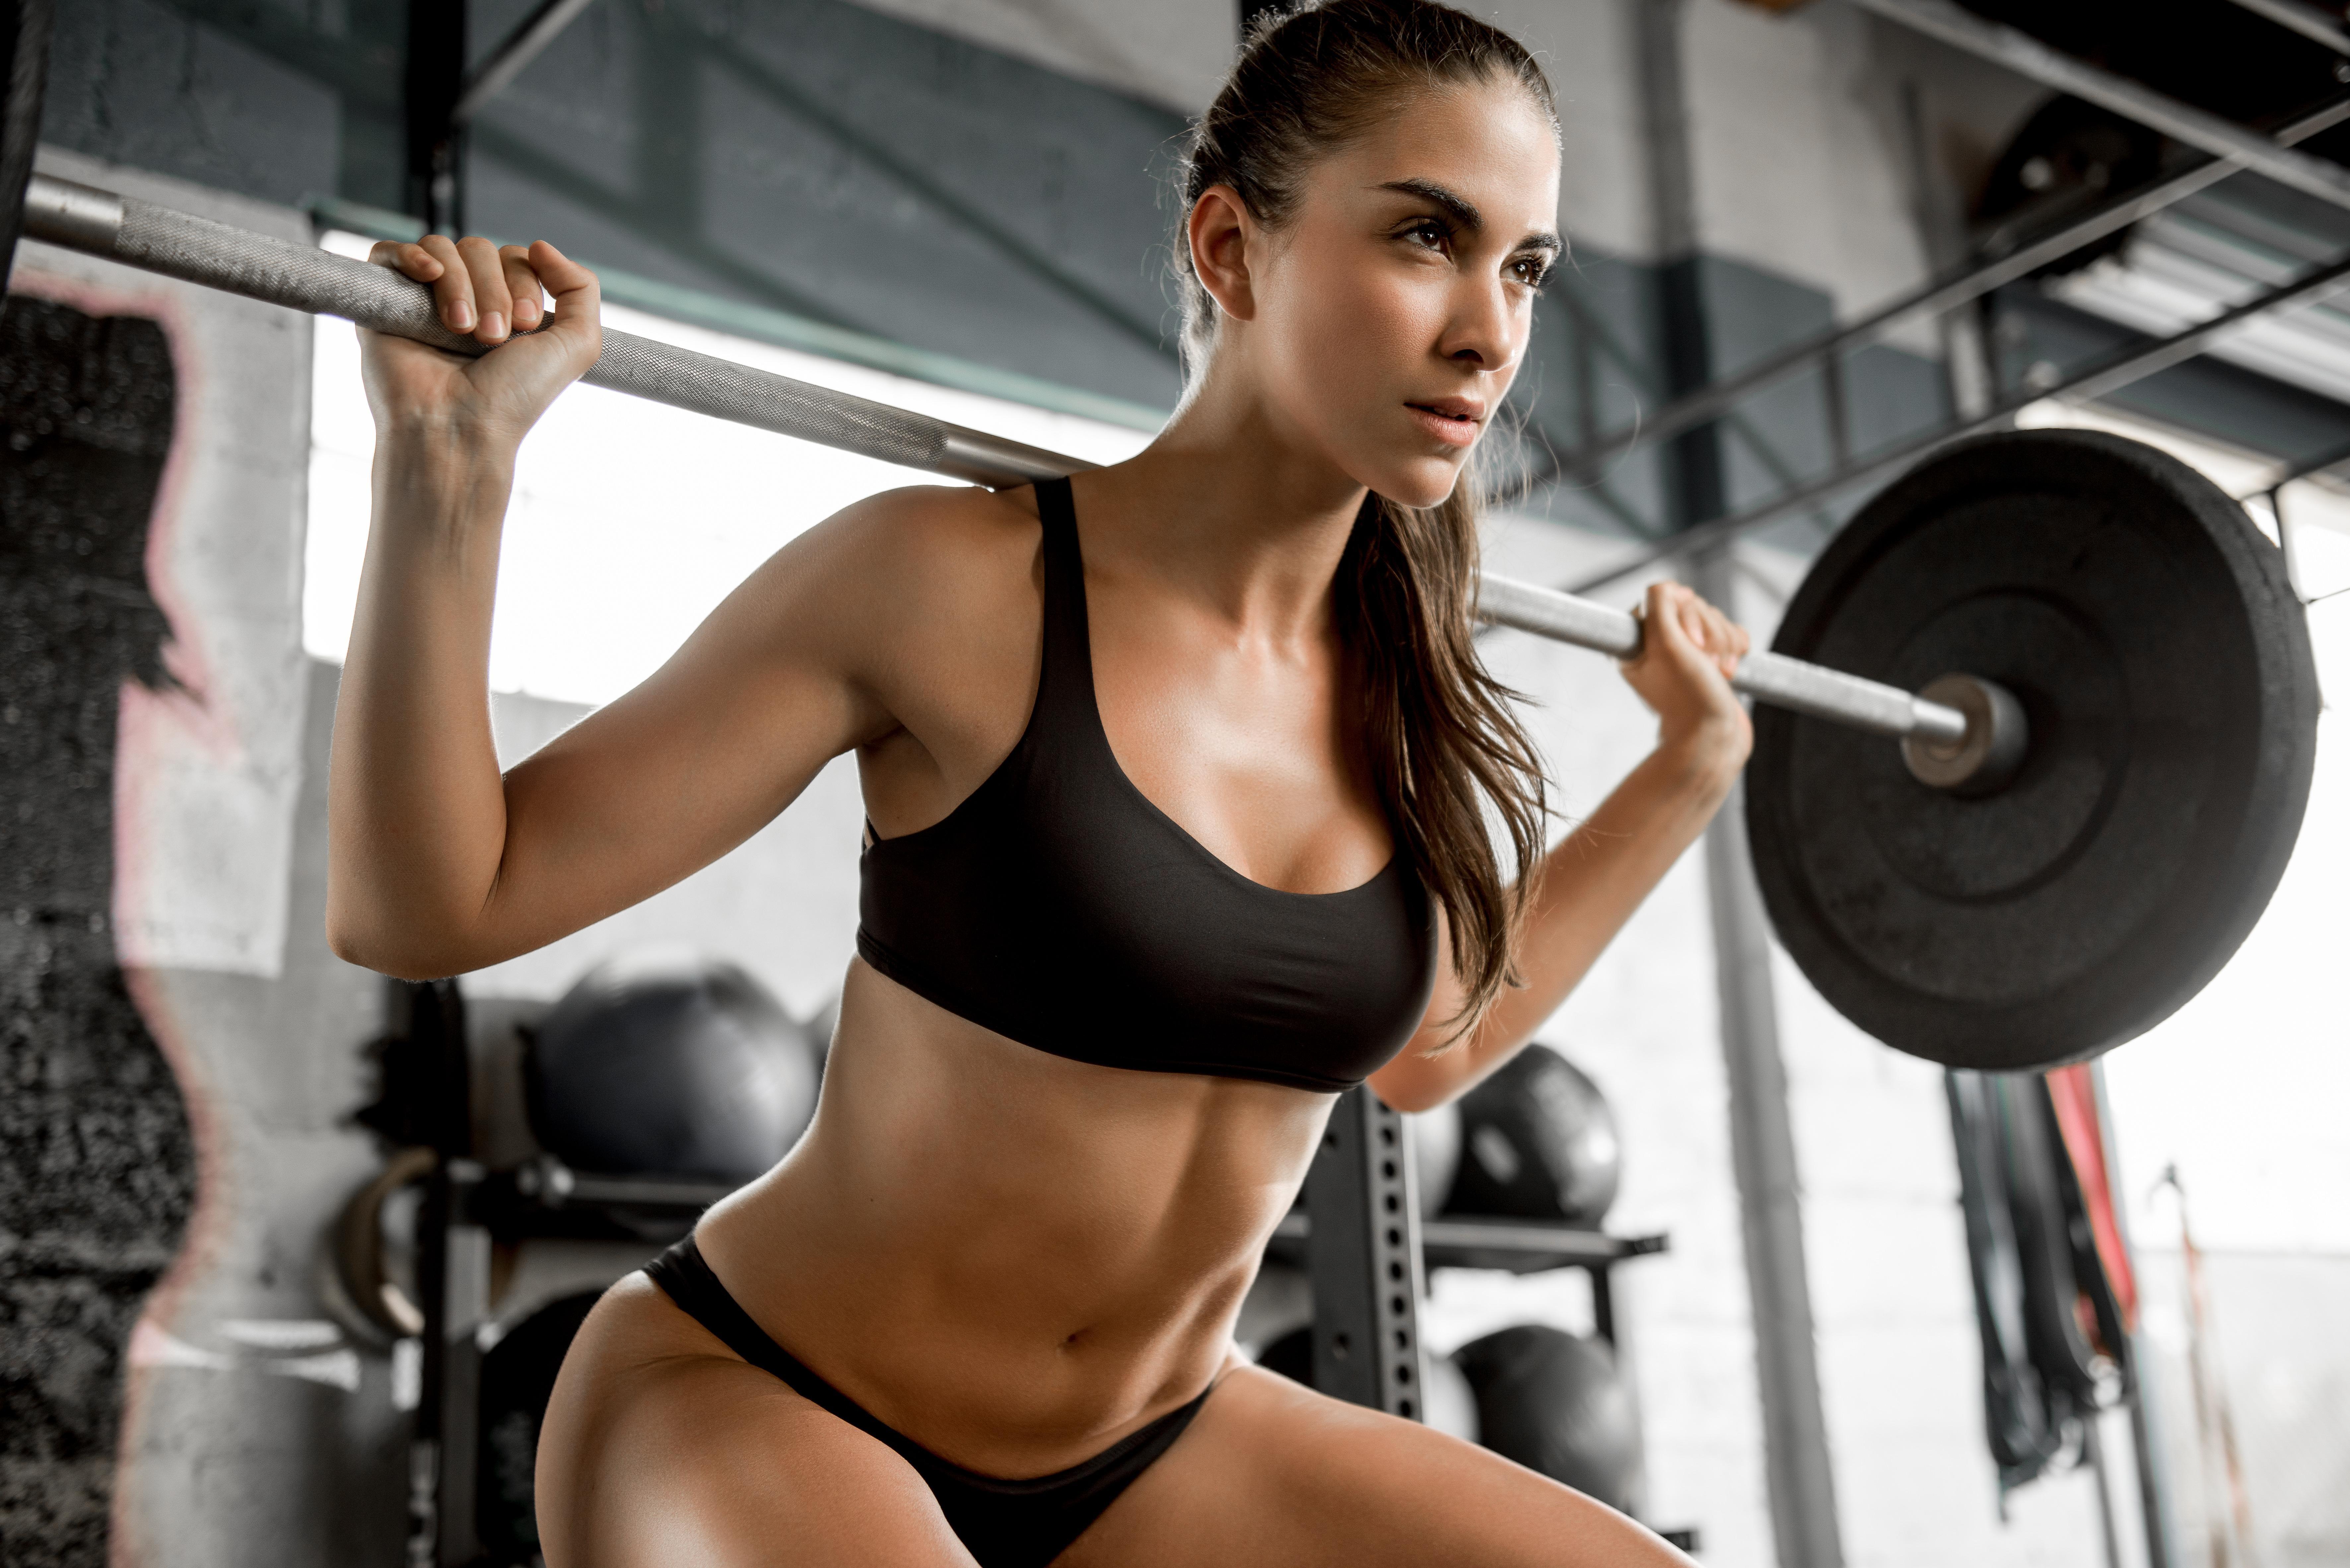 Wallpaper Women Portrait Room Tanned Gyms Fitness